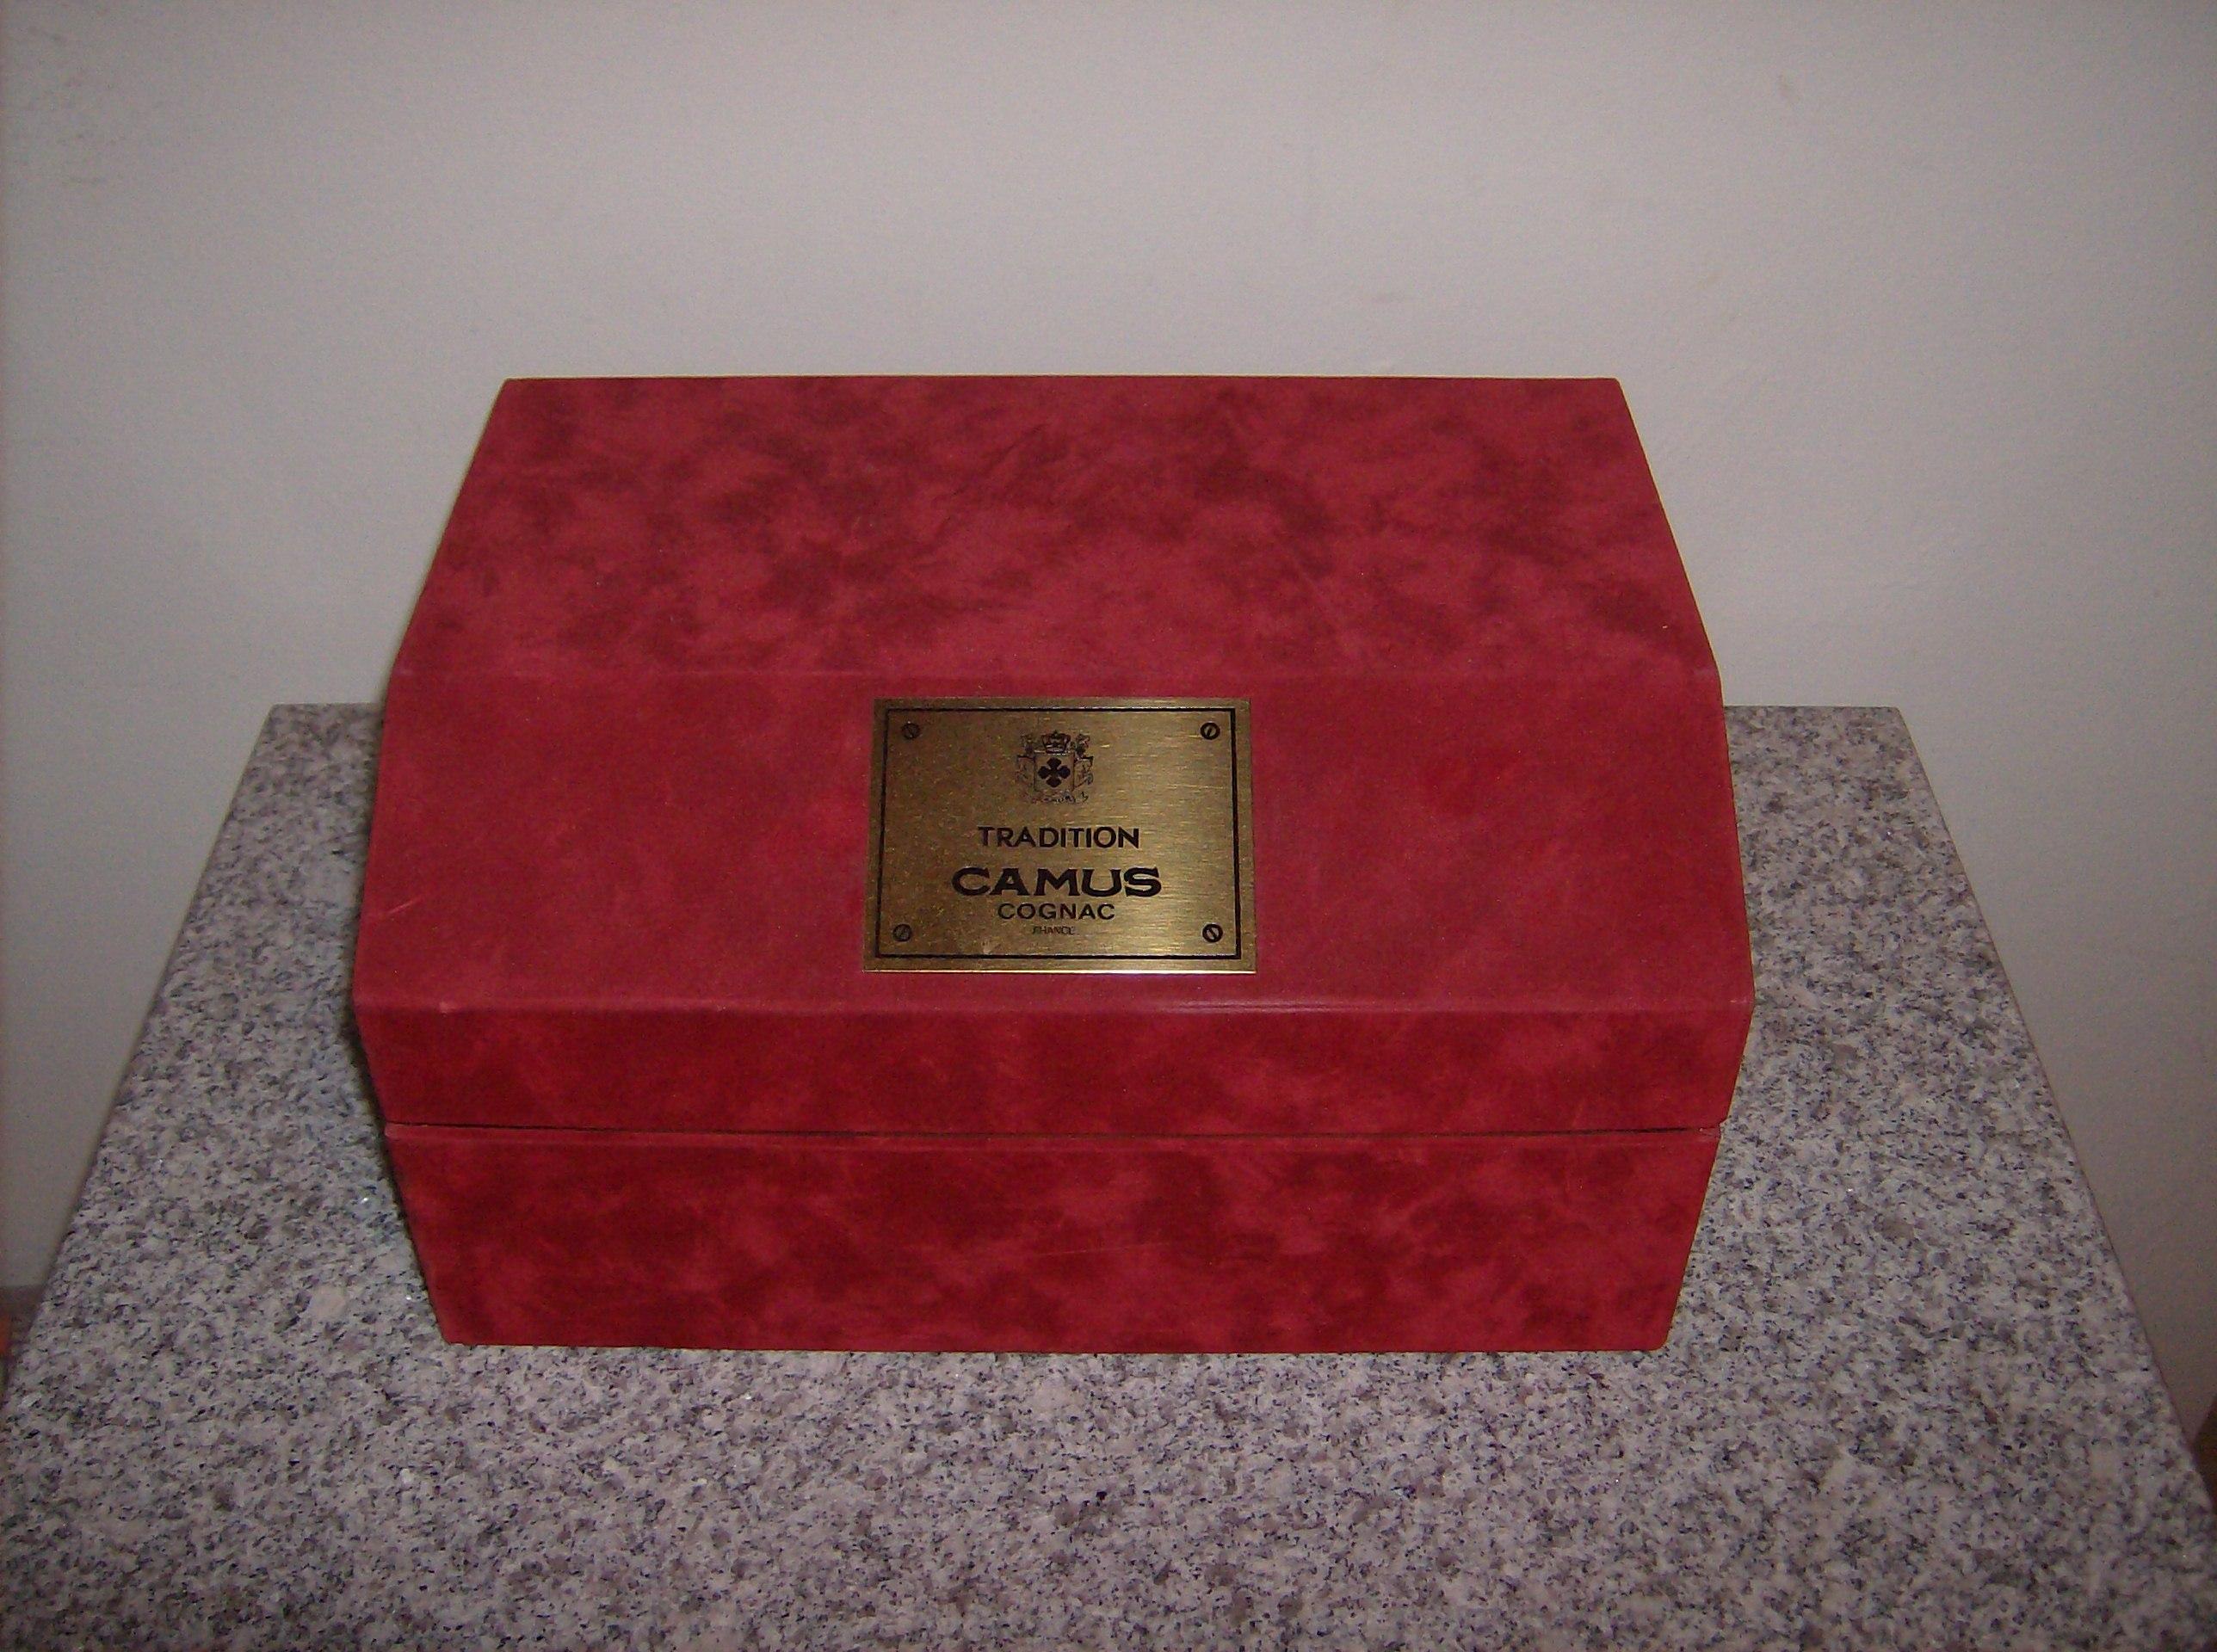 Tradition Camus Cognac box